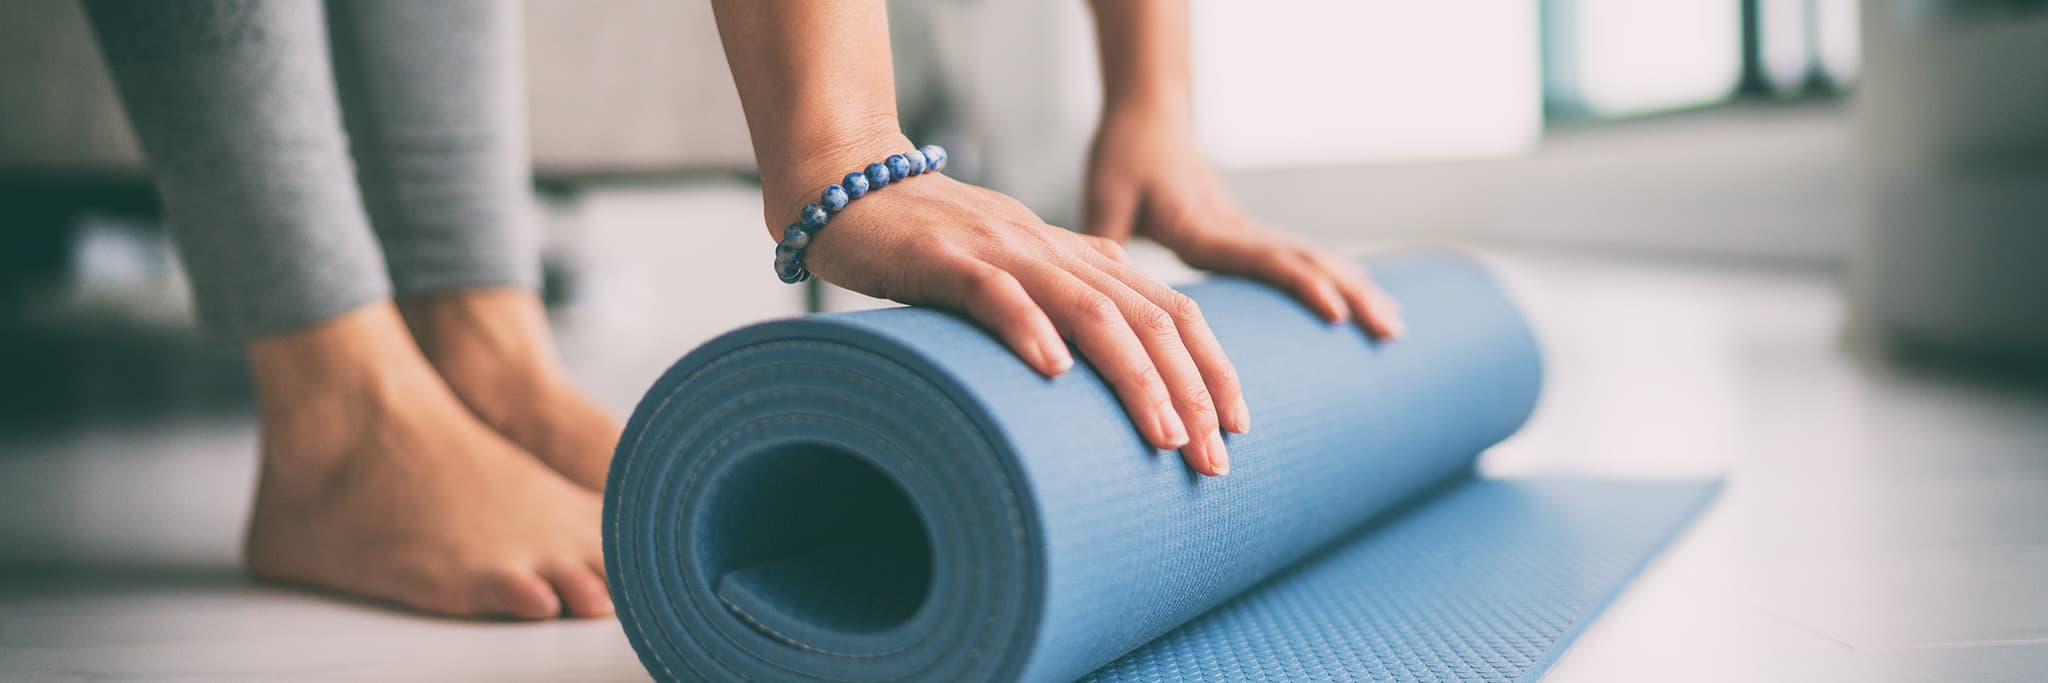 Woman unrolling her yoga mat